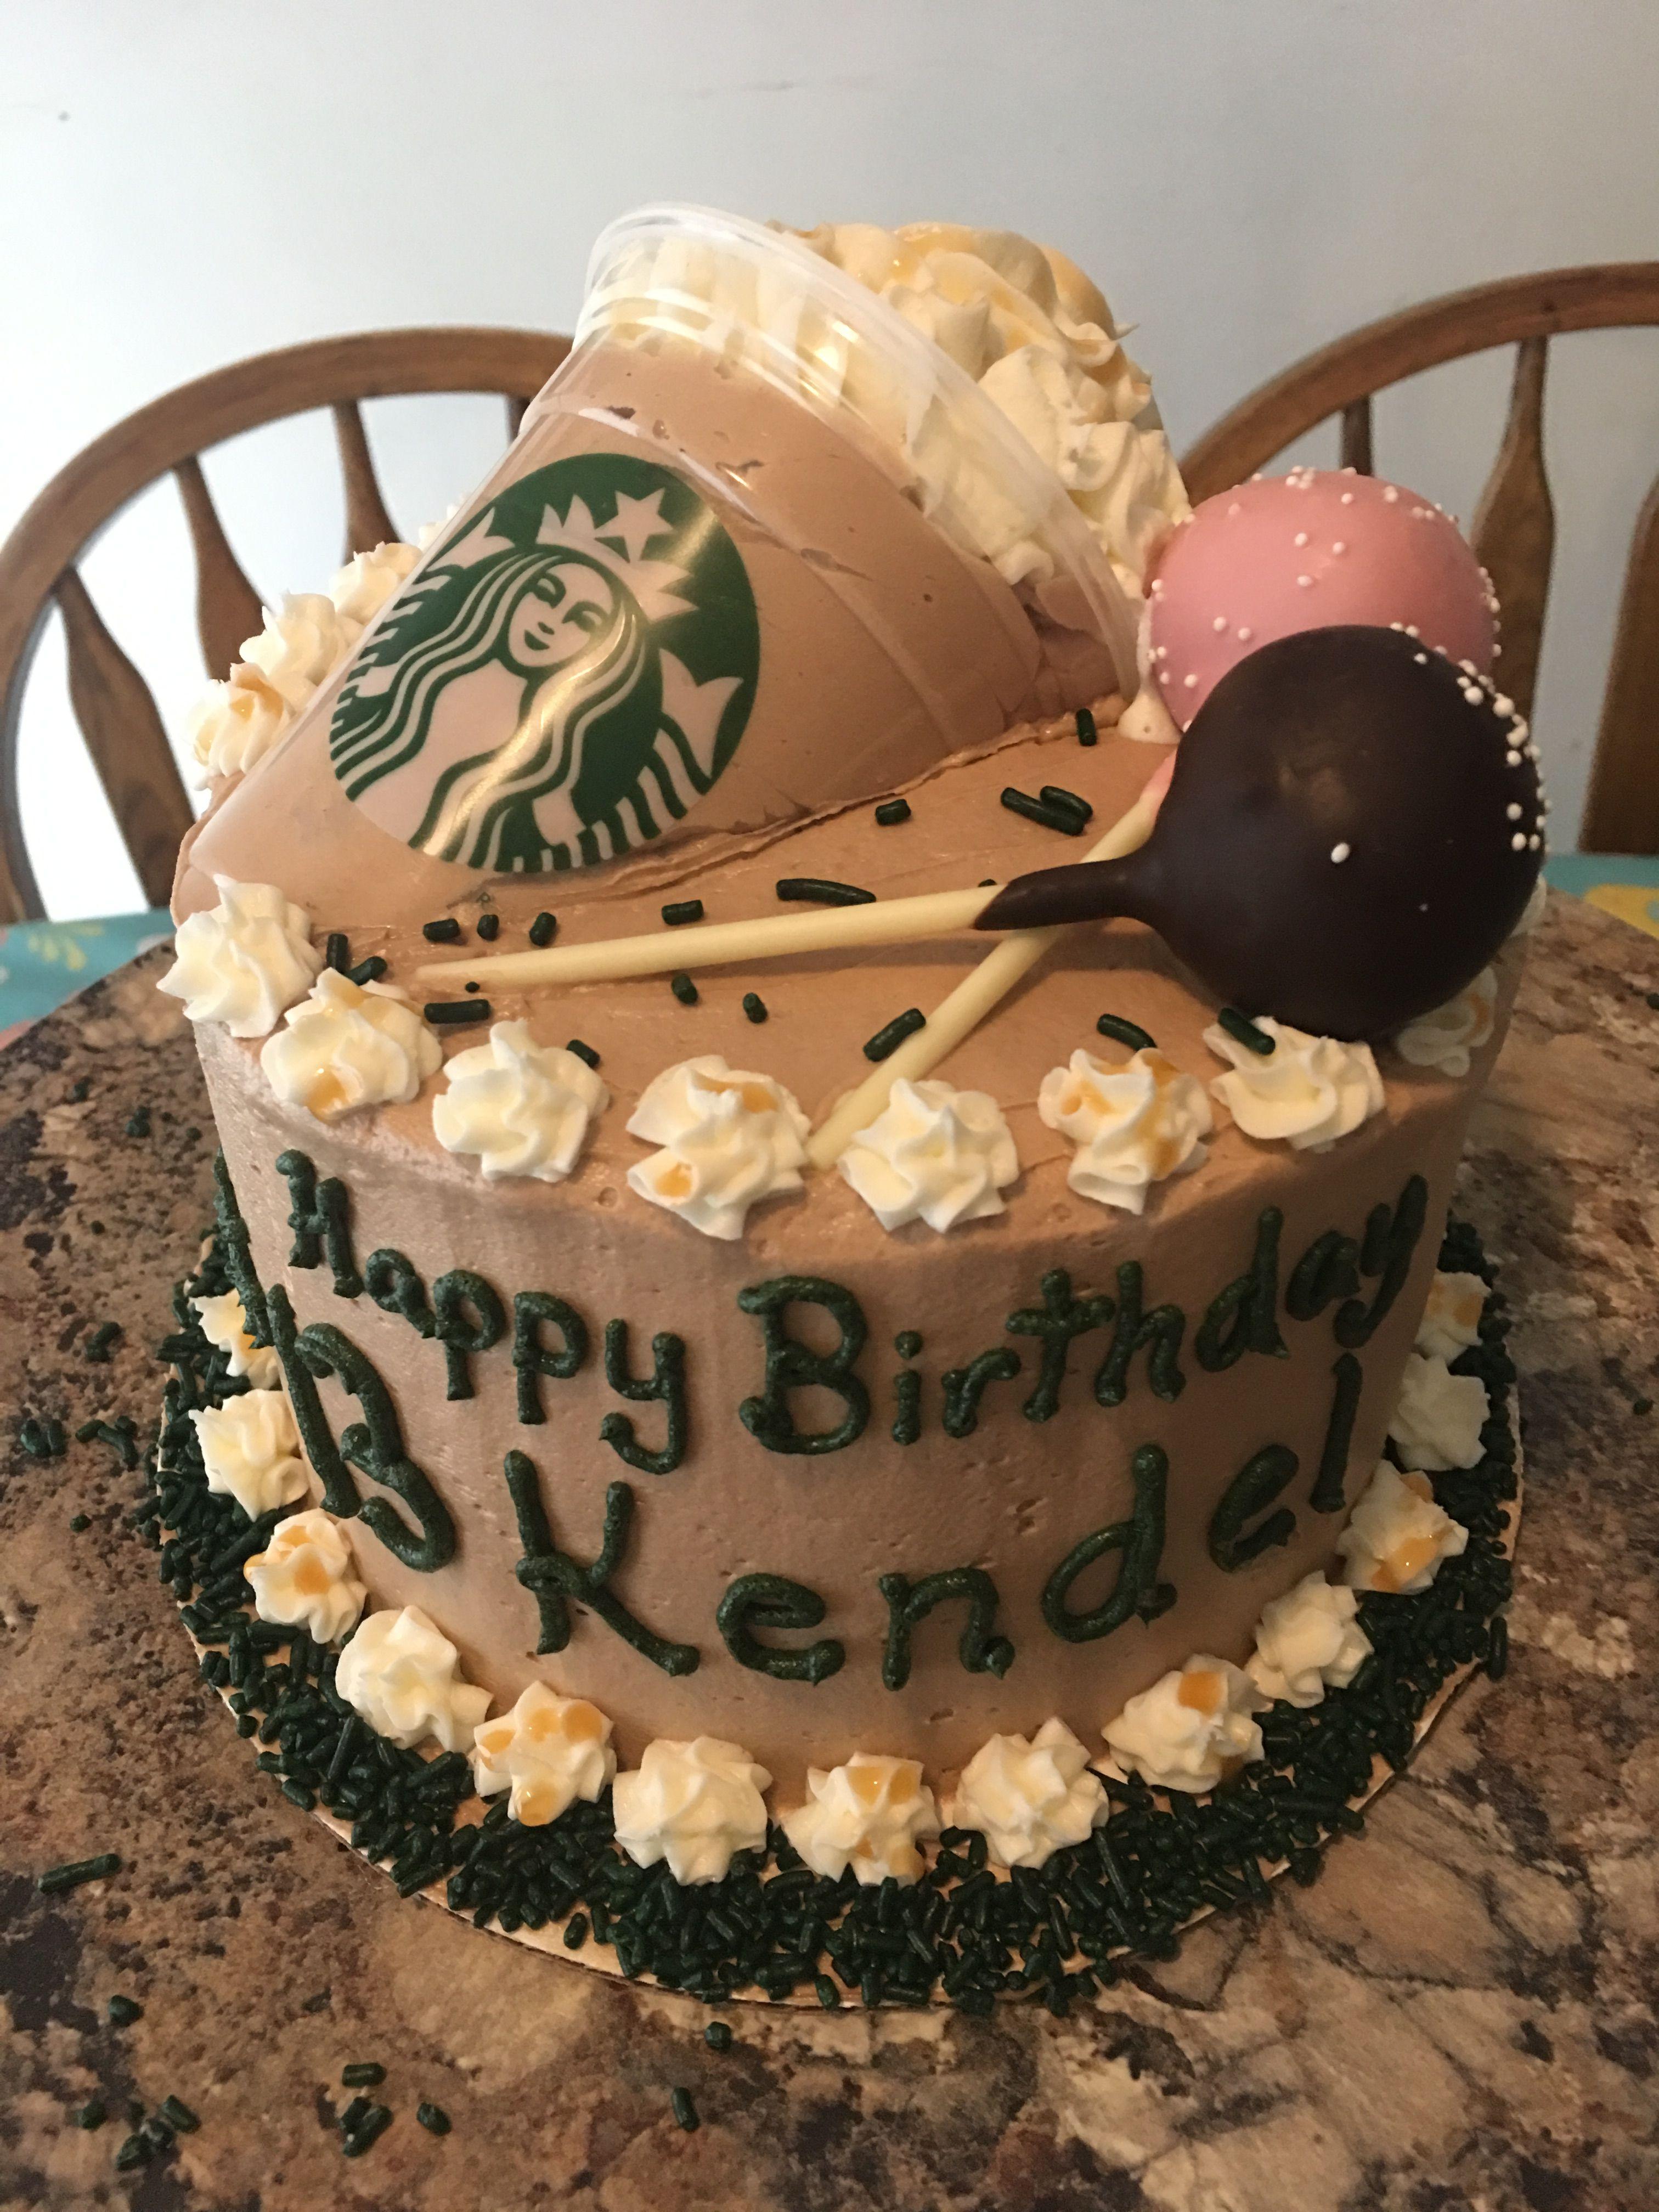 Awe Inspiring Starbucks Birthday Cake With Images 14Th Birthday Cakes Funny Birthday Cards Online Unhofree Goldxyz